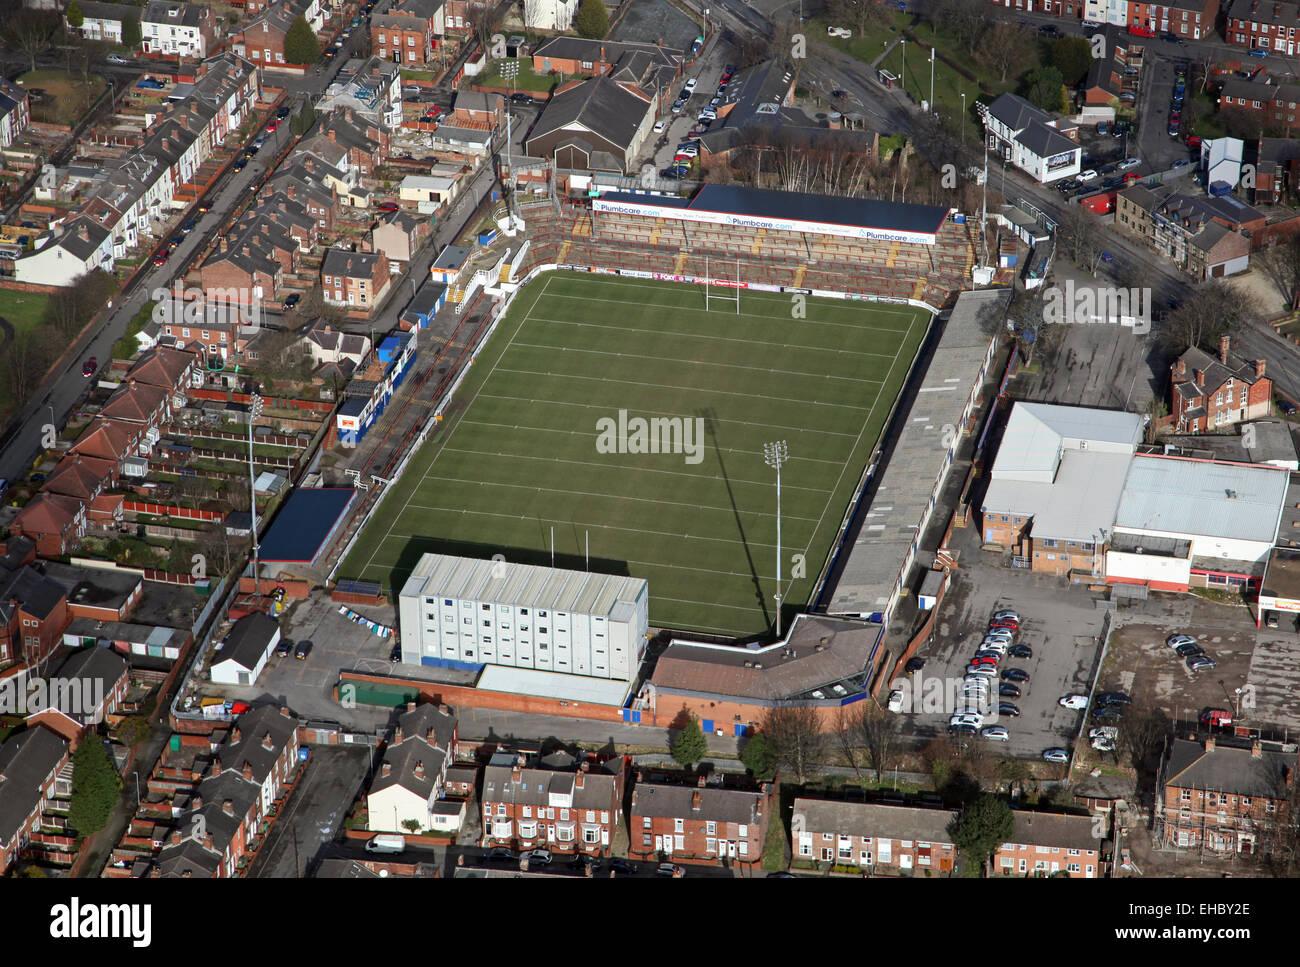 Vue aérienne de Wakefield Trinity Wildcats Rugby League stade de Belle Vue, Wakefield, Royaume-Uni Photo Stock